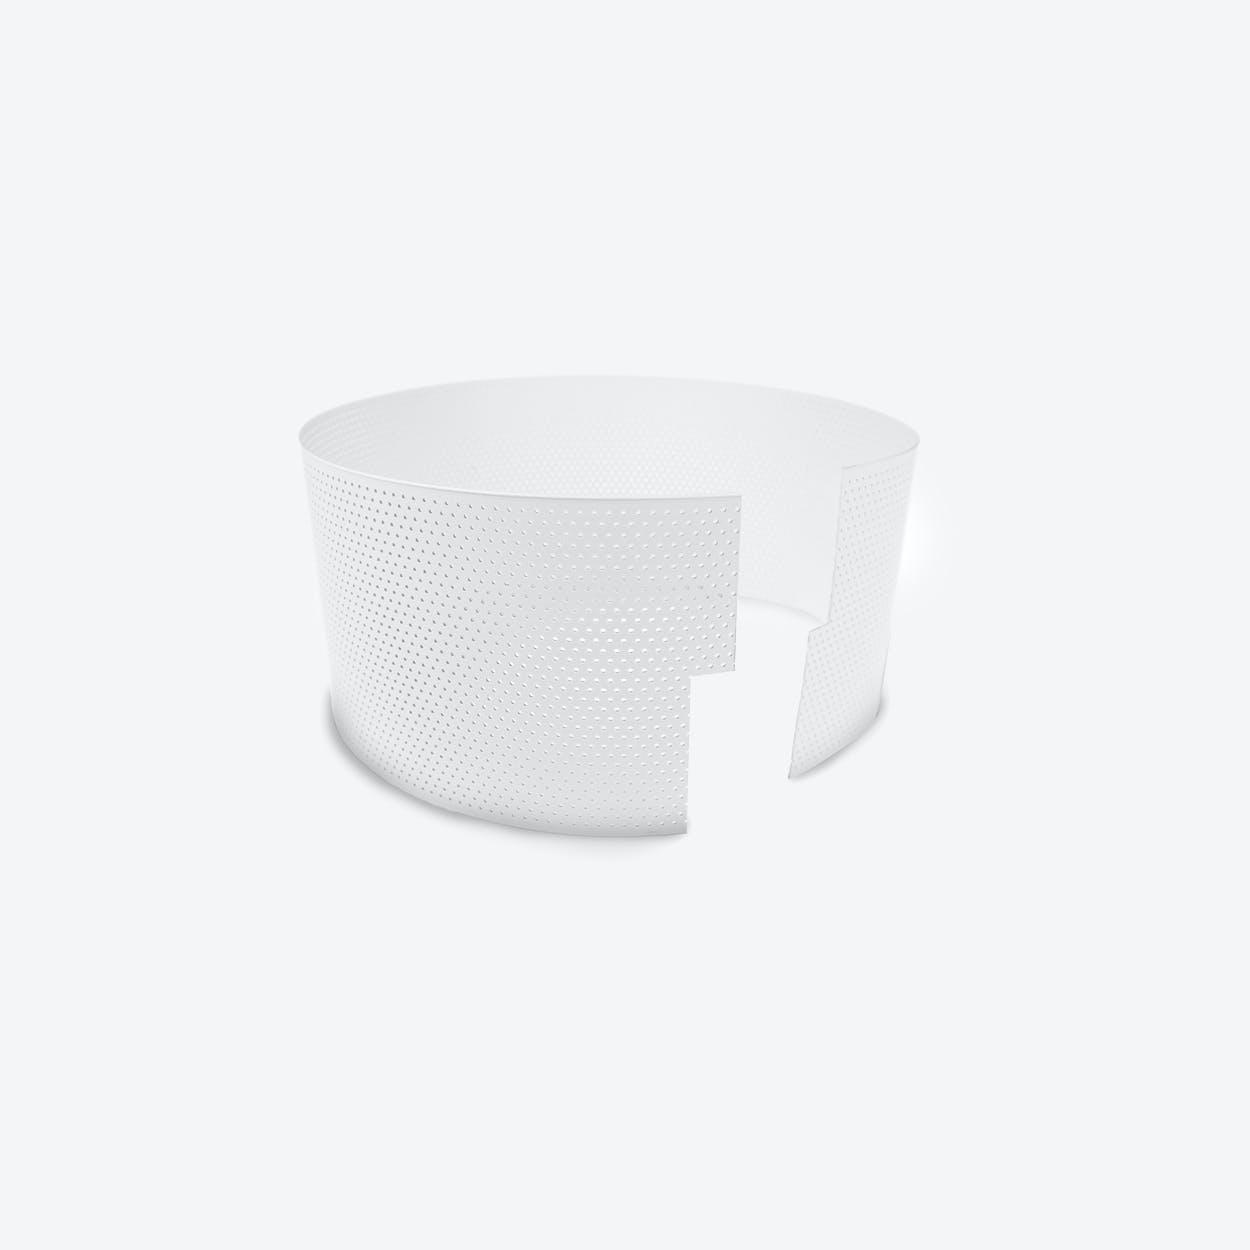 Spool Spare Parts in White (skin)